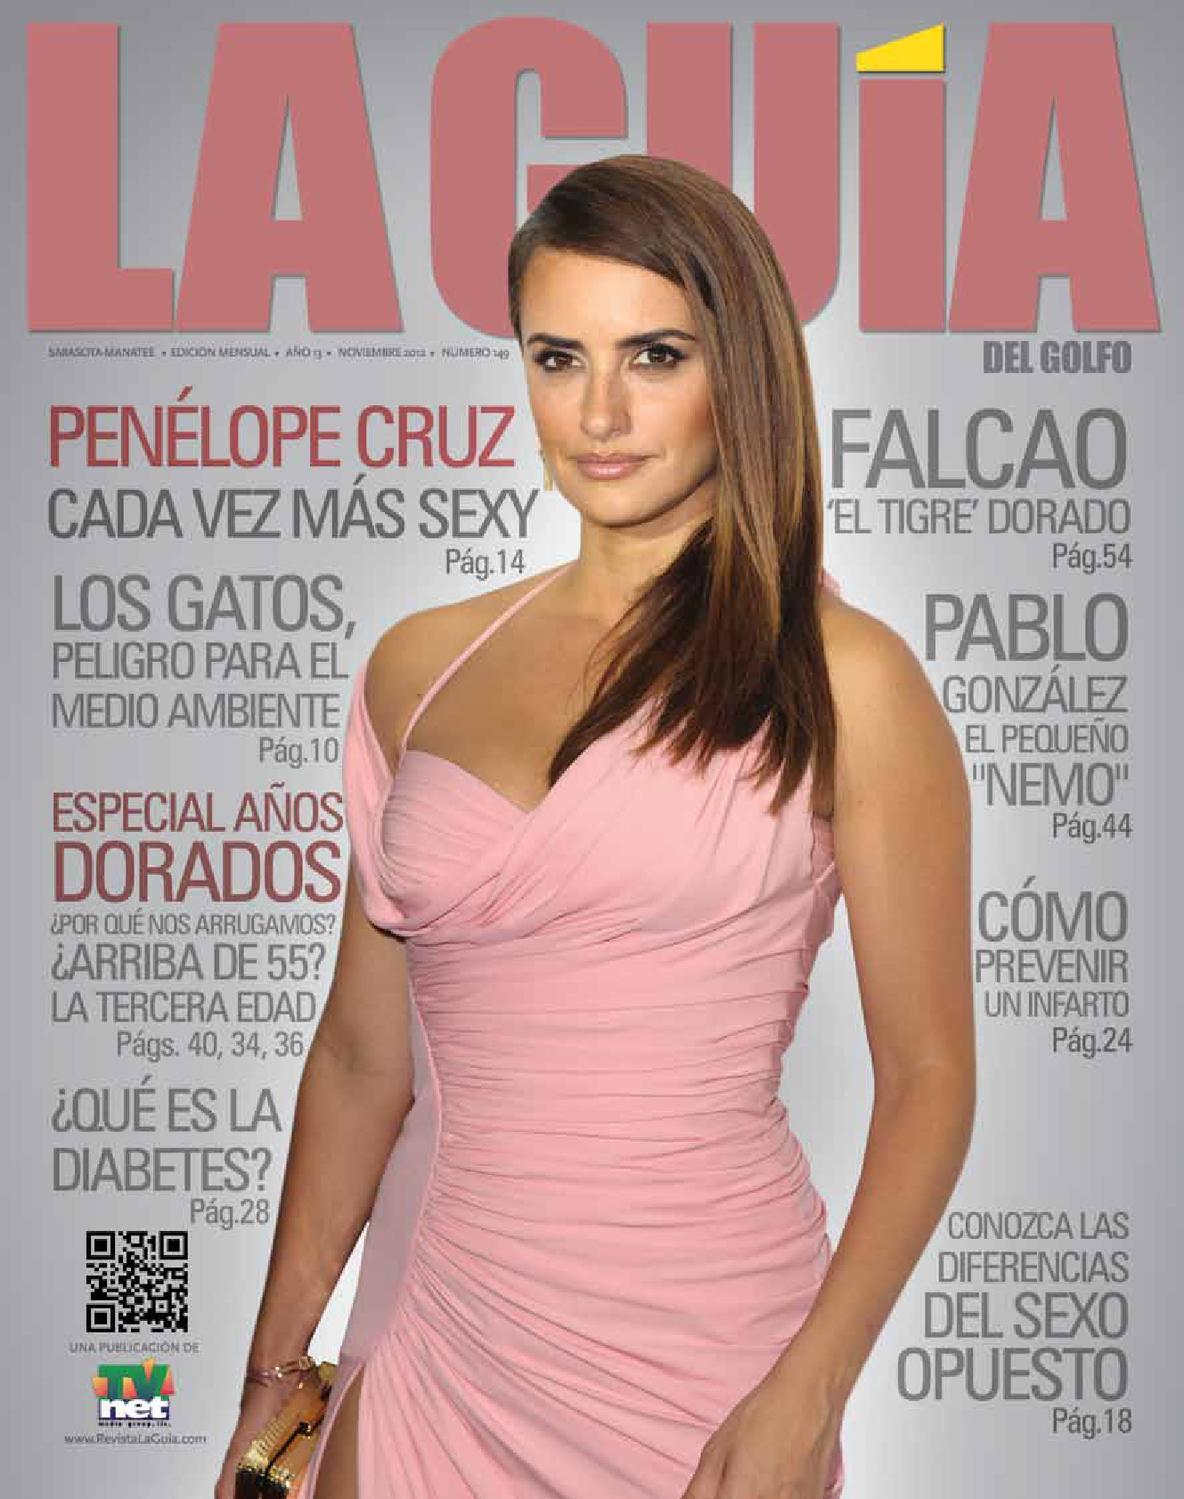 La Guía Tampa Bay - Ed 149 by TV Net Media Group, LLC. - issuu